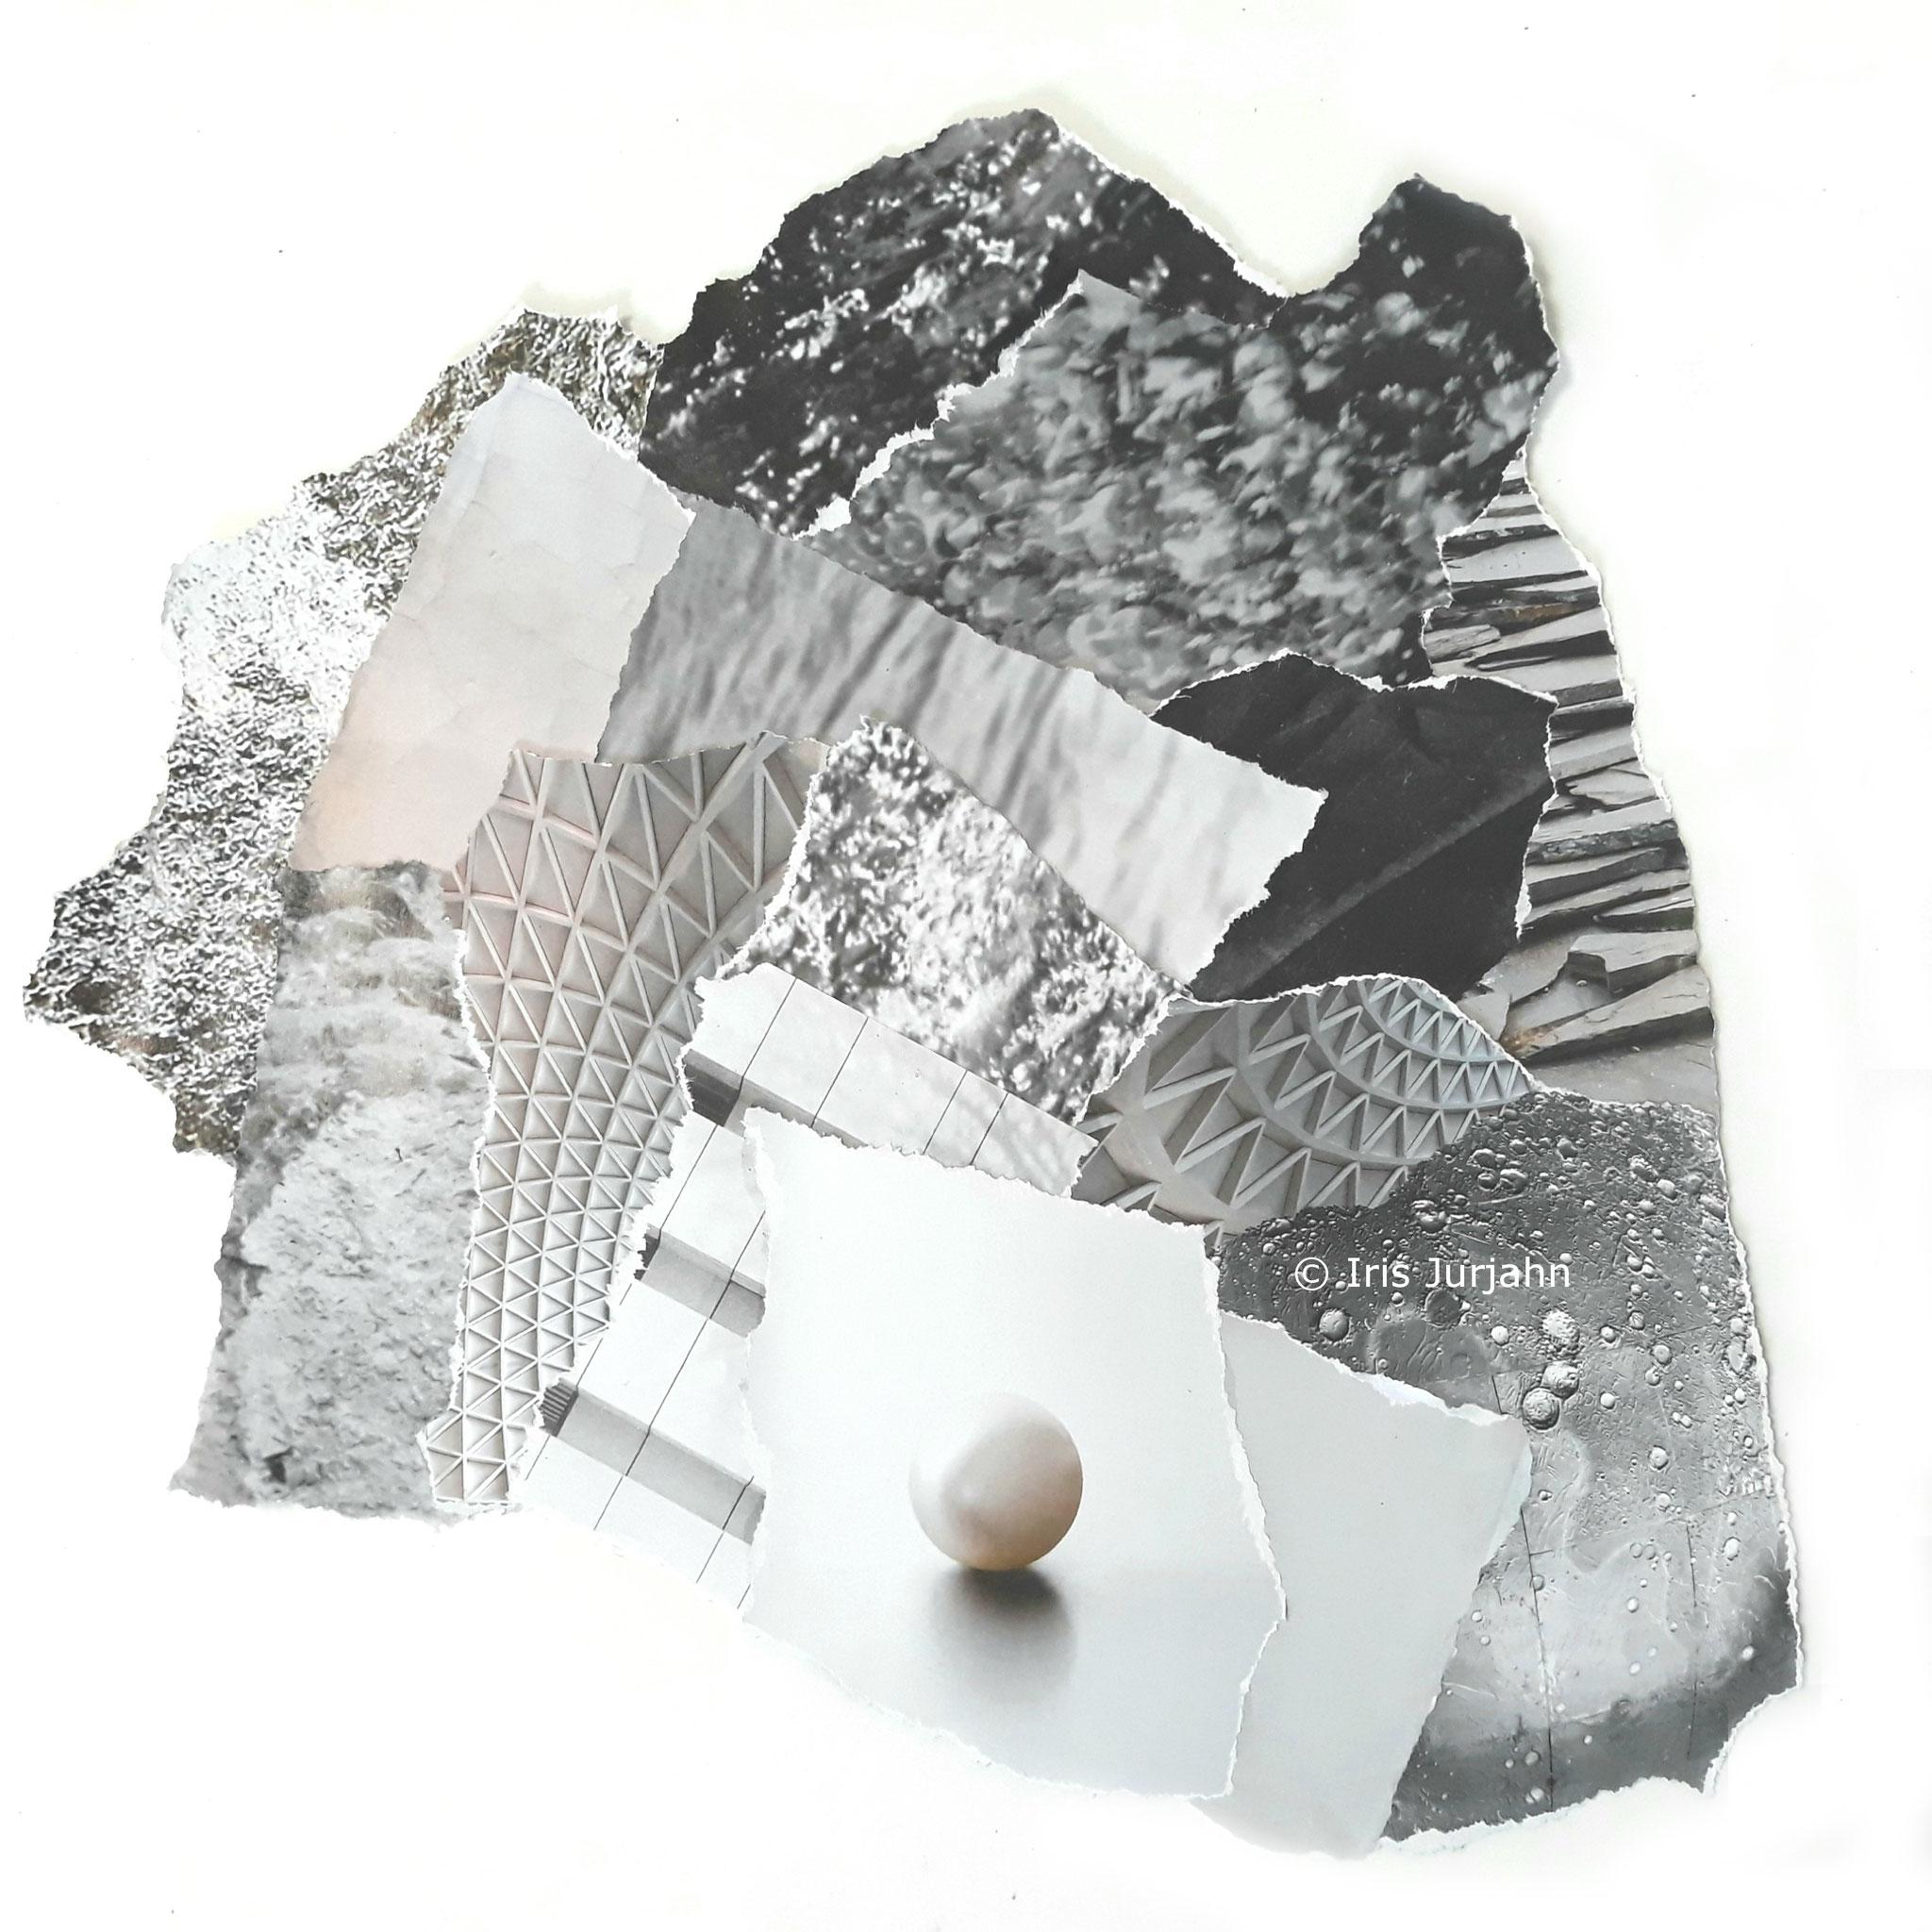 Pearl, Papiercollage, 30 x 26 cm (inkl. Objektrahmen), 2019